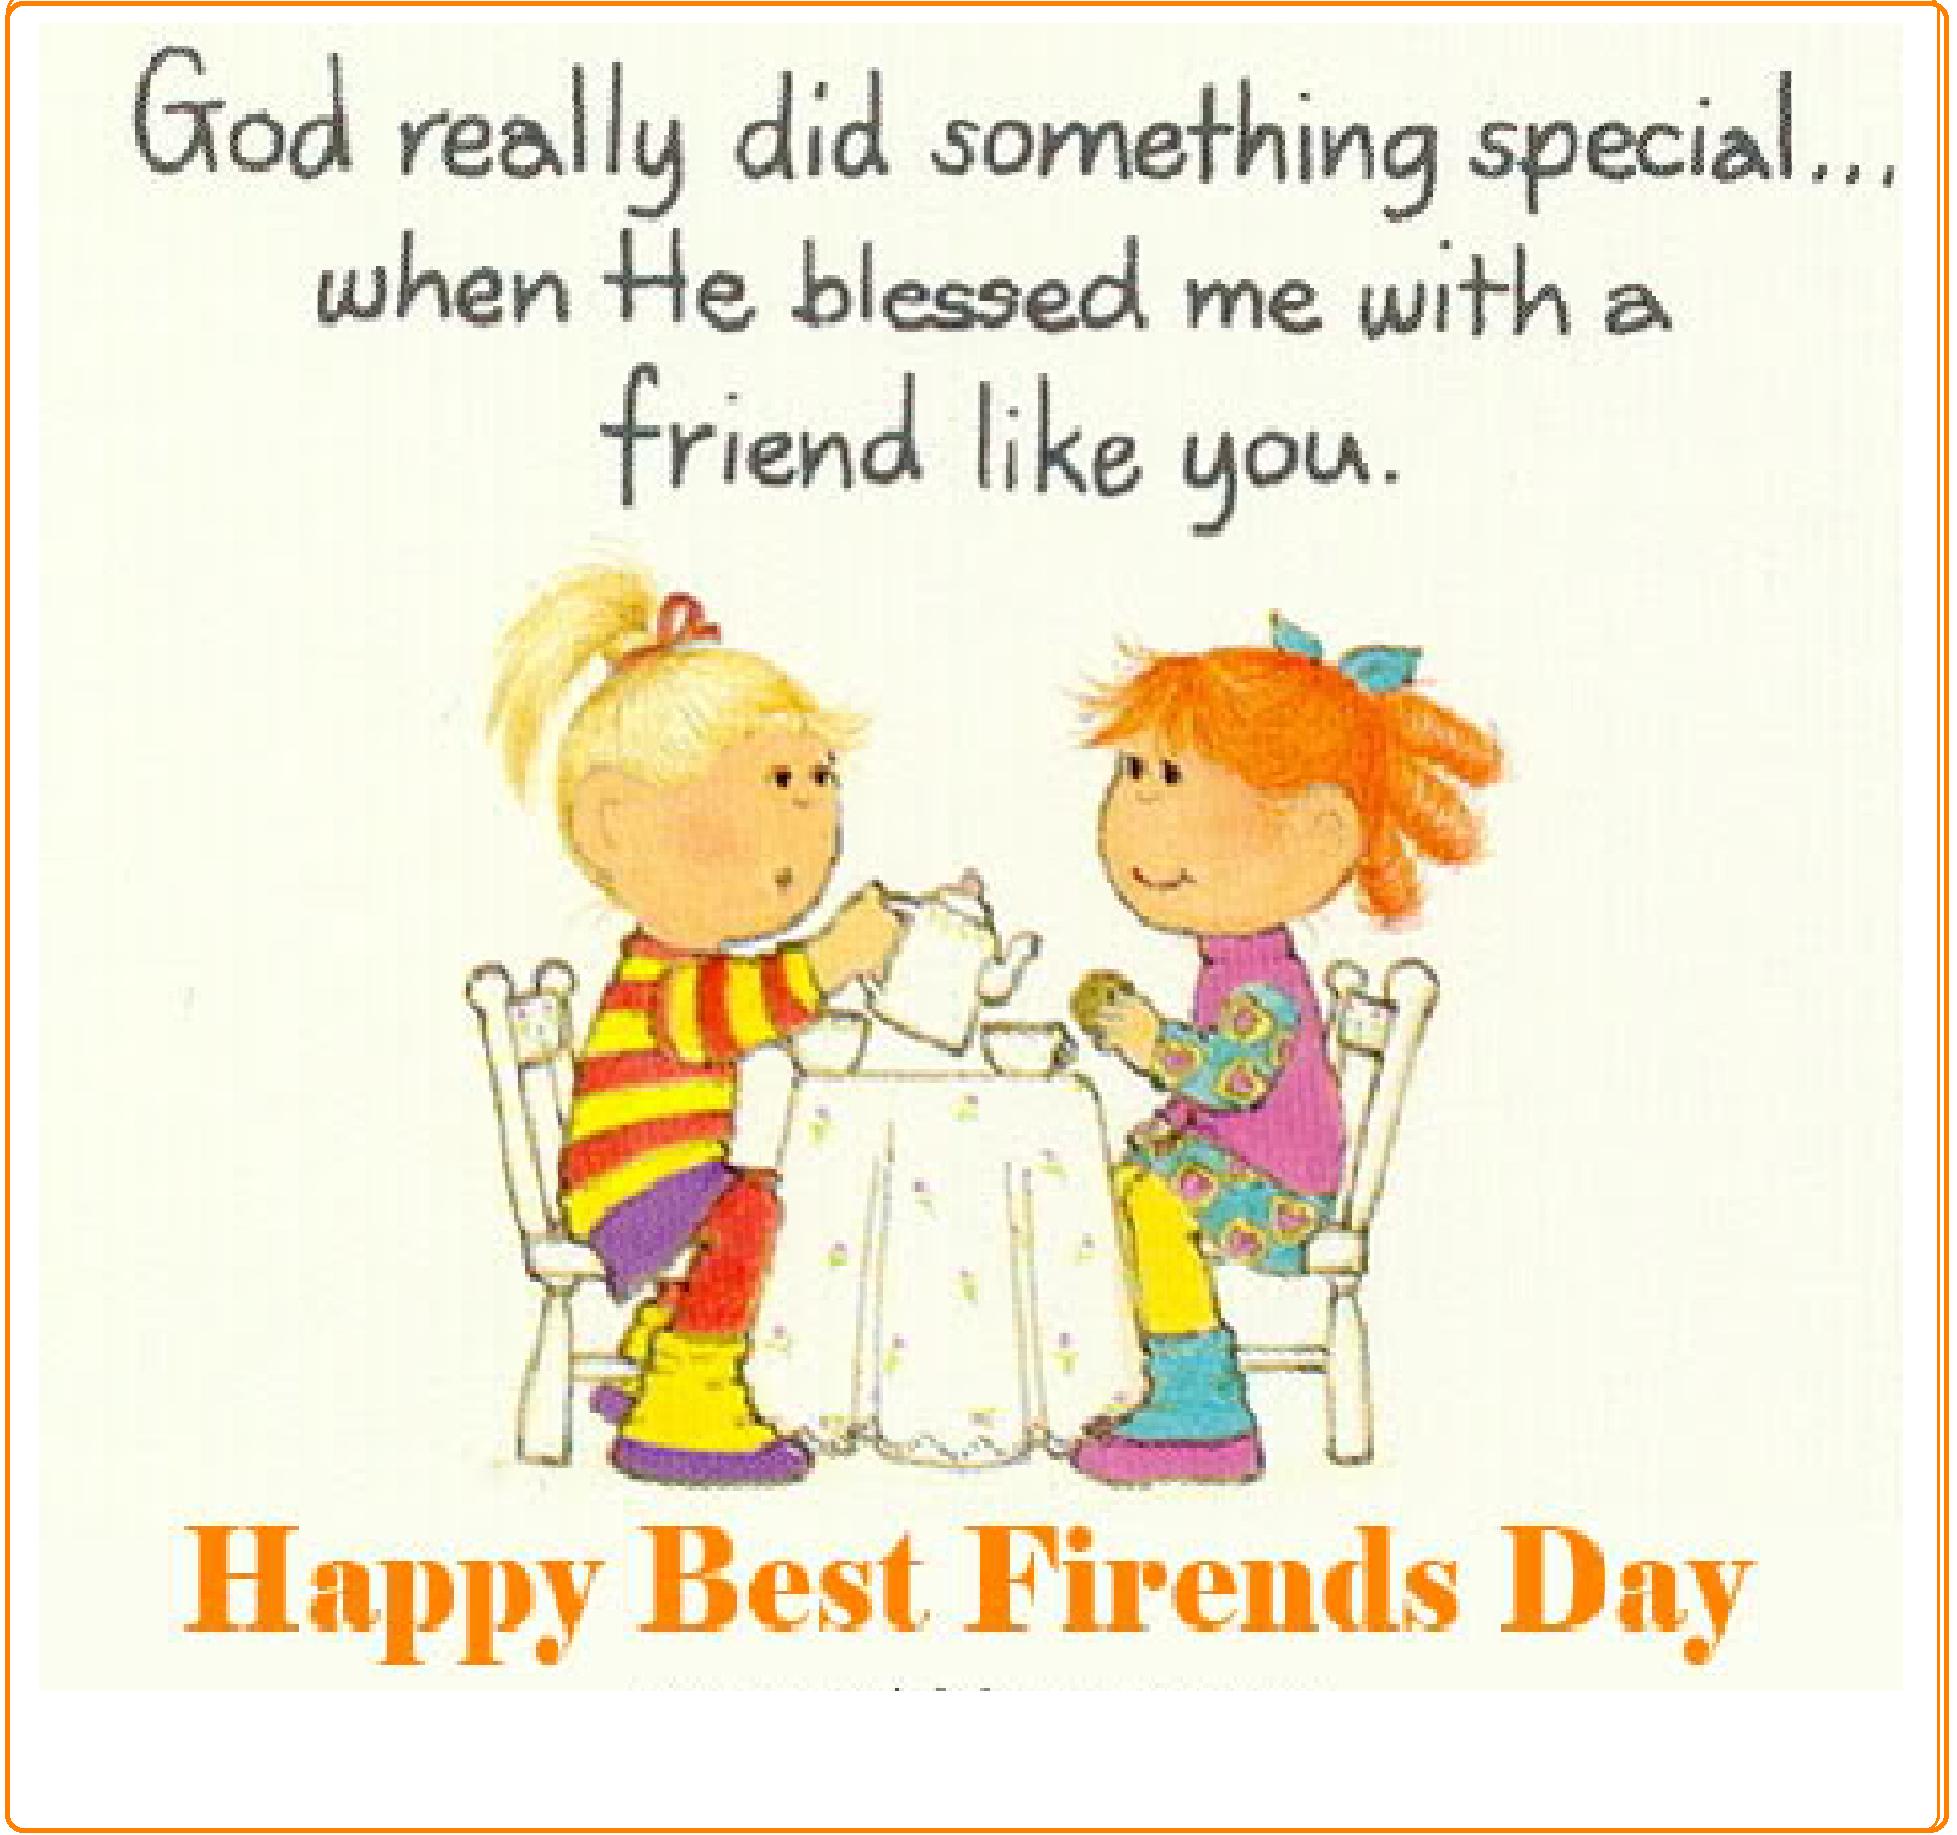 Happy Friendship Day Quotes Best Friend Day Best Friend Quotes Friends Quotes